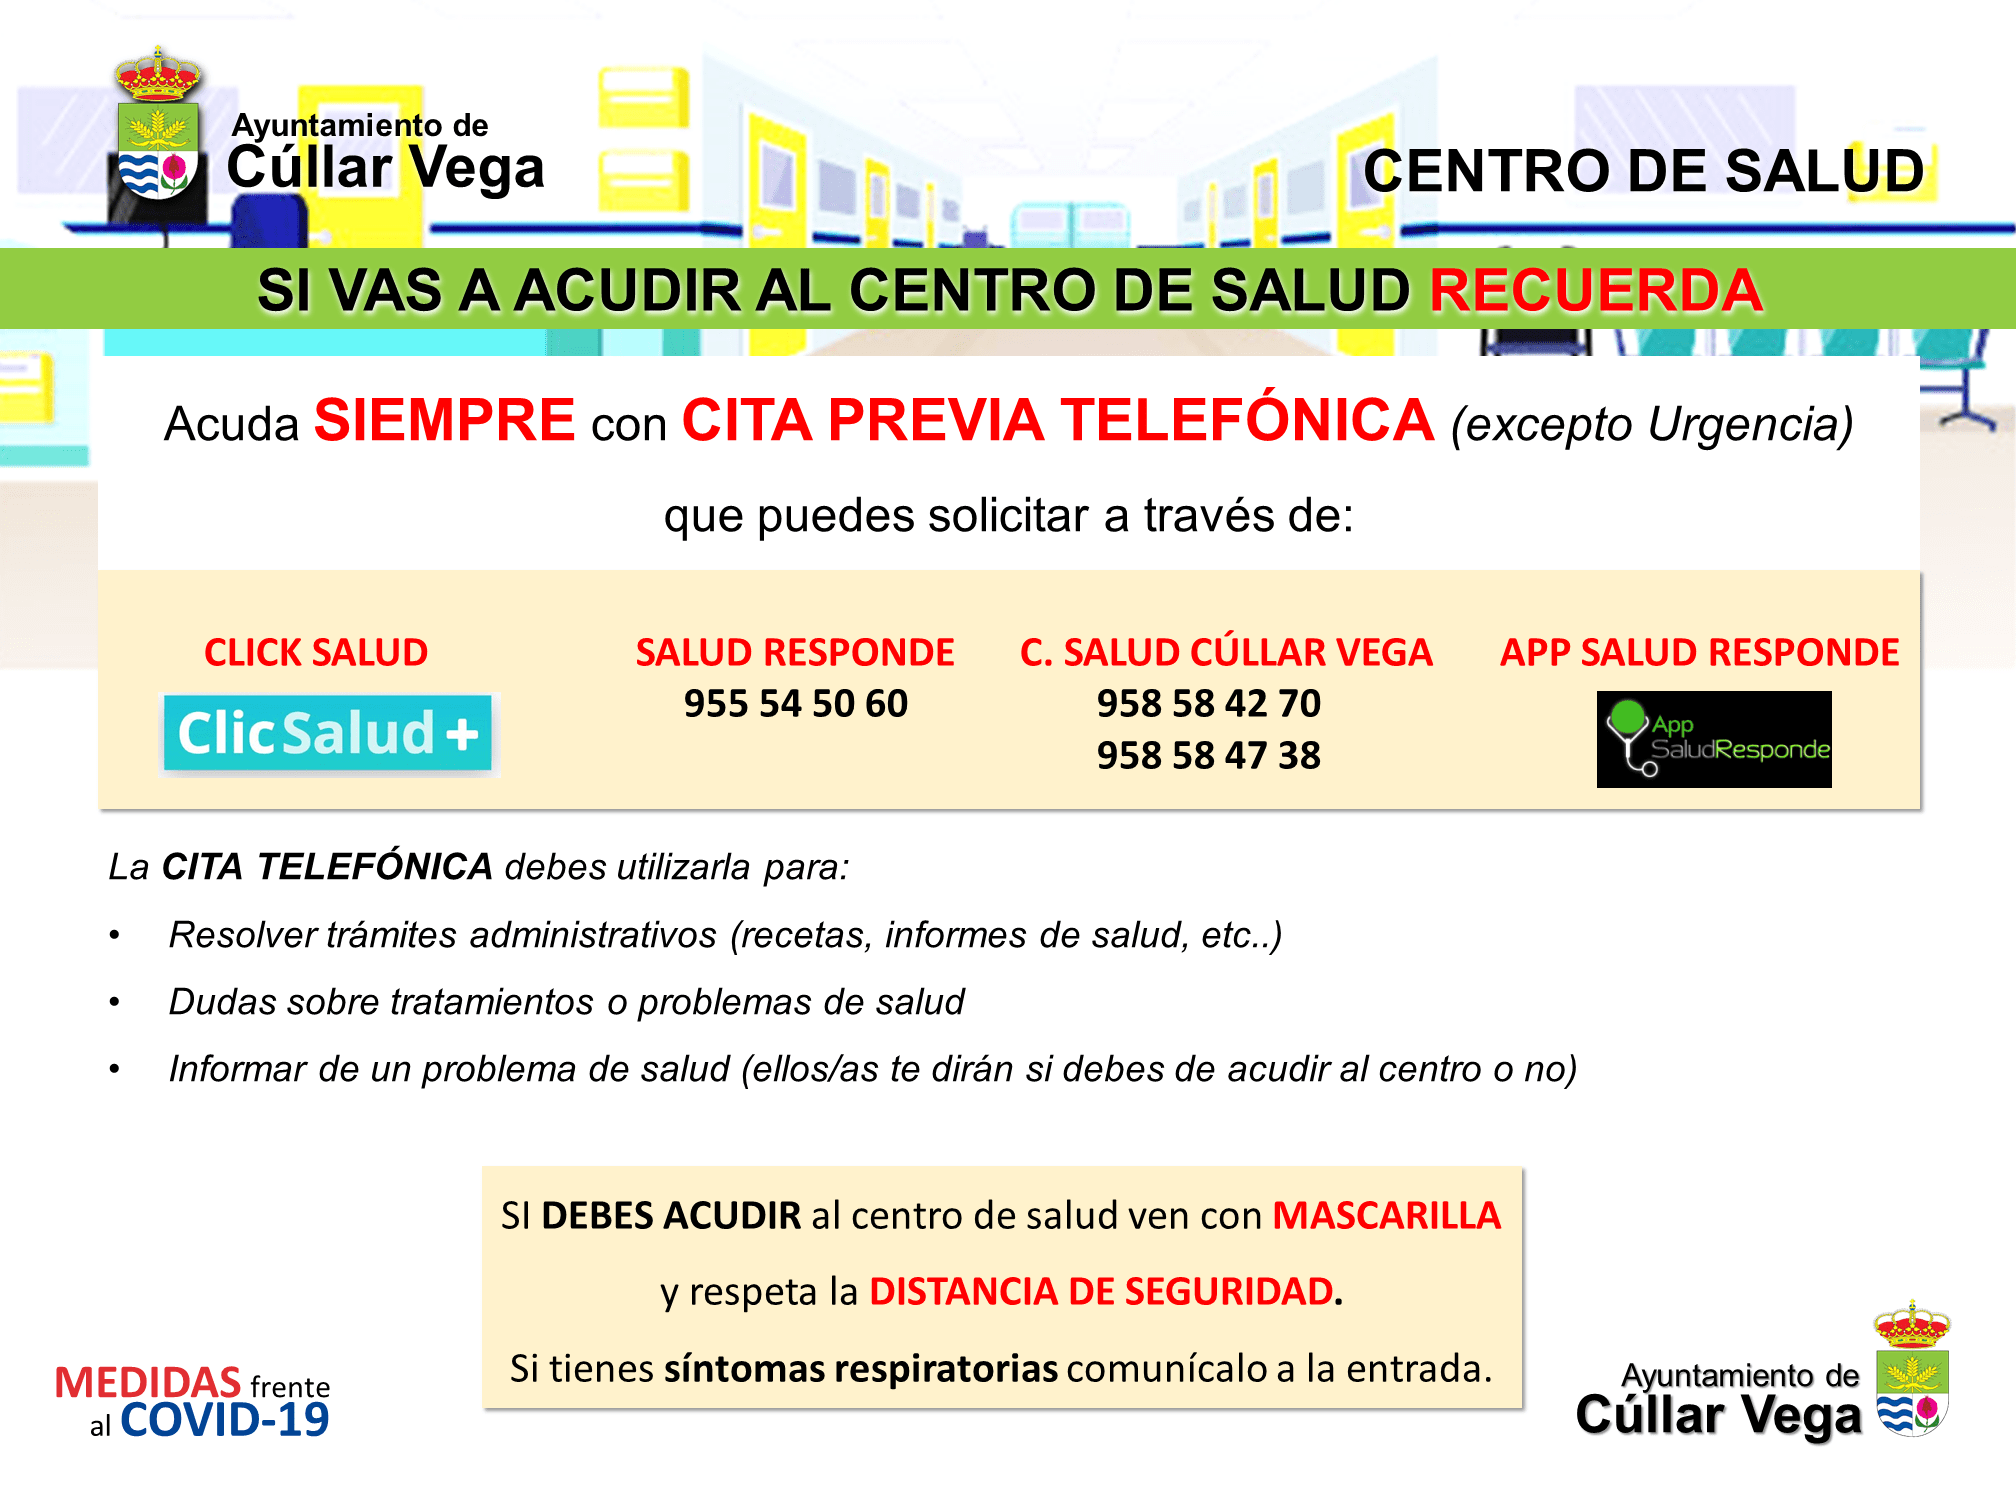 Reapertura del Centro de Salud de Cúllar Vega